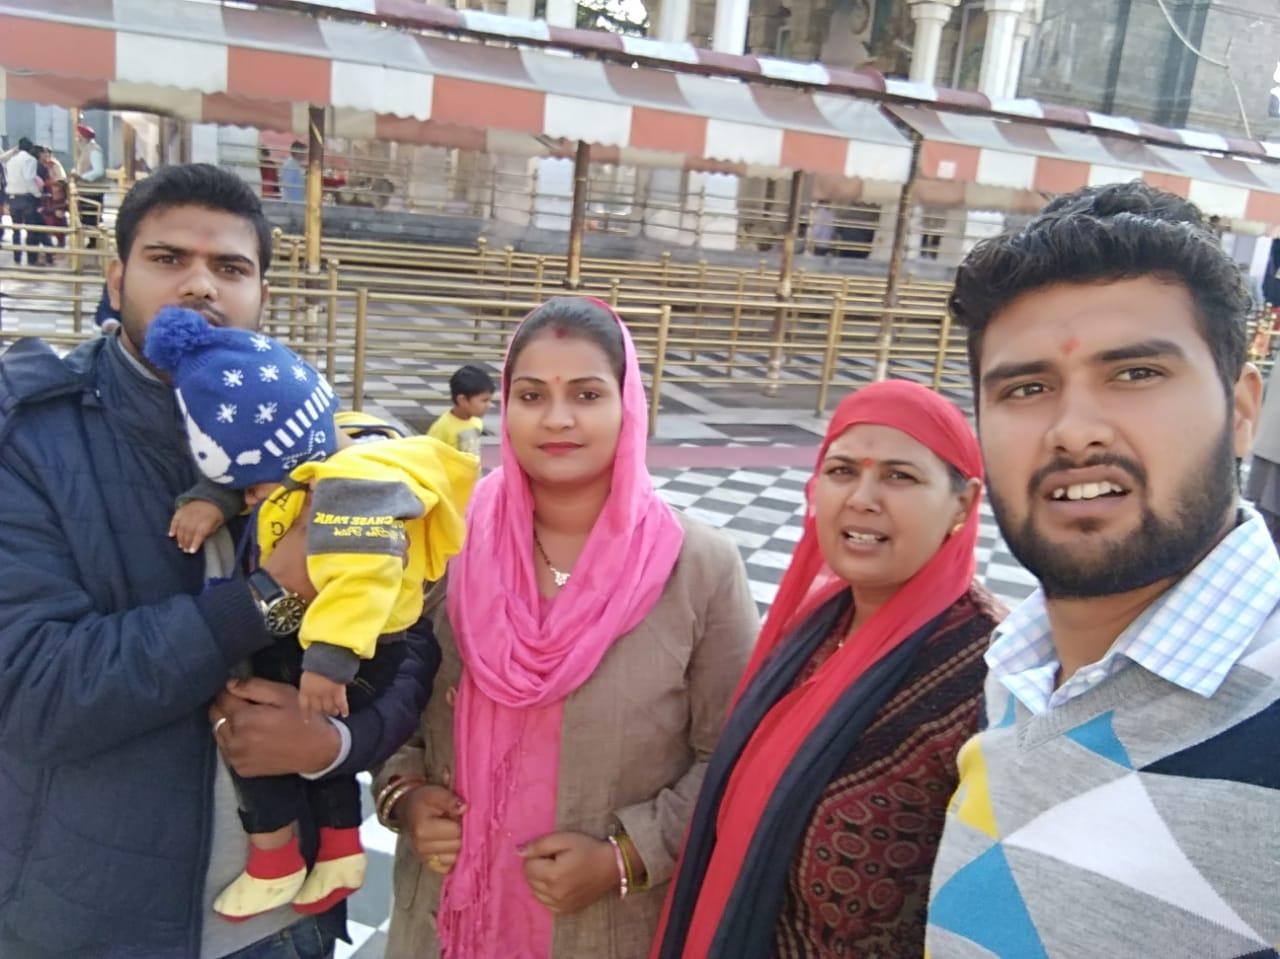 Cpl Pankaj Kumar with his family members